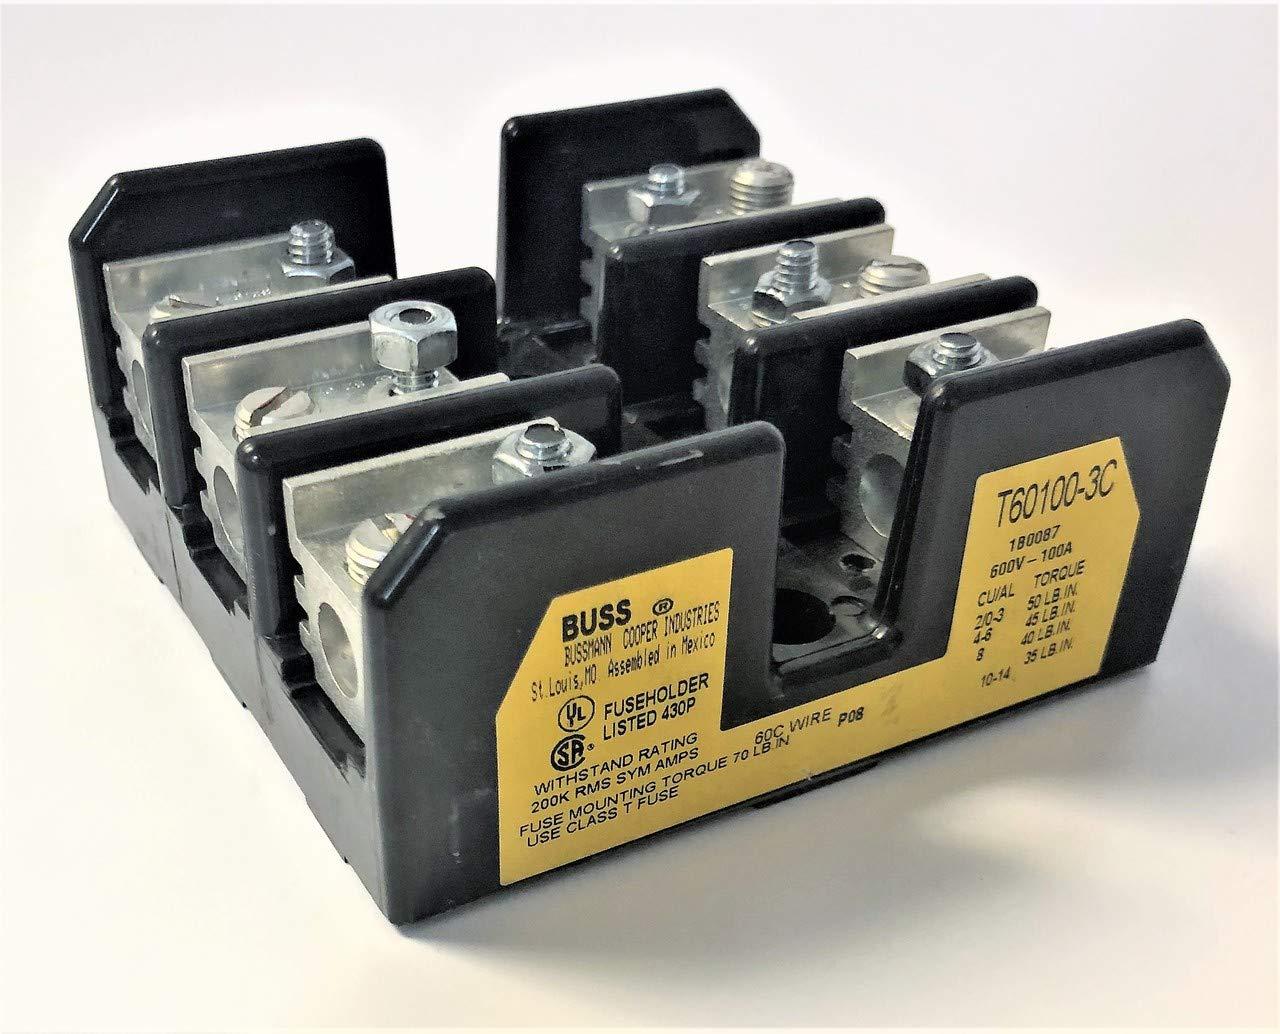 EDISON FUSE T60100-3C 3-Pole, Box Lug, 14-2/0 AWG Copper OR Aluminum, 100A,  600V, Panel Mount, Accepts Class T FUSES: Amazon.com: Industrial &  ScientificAmazon.com